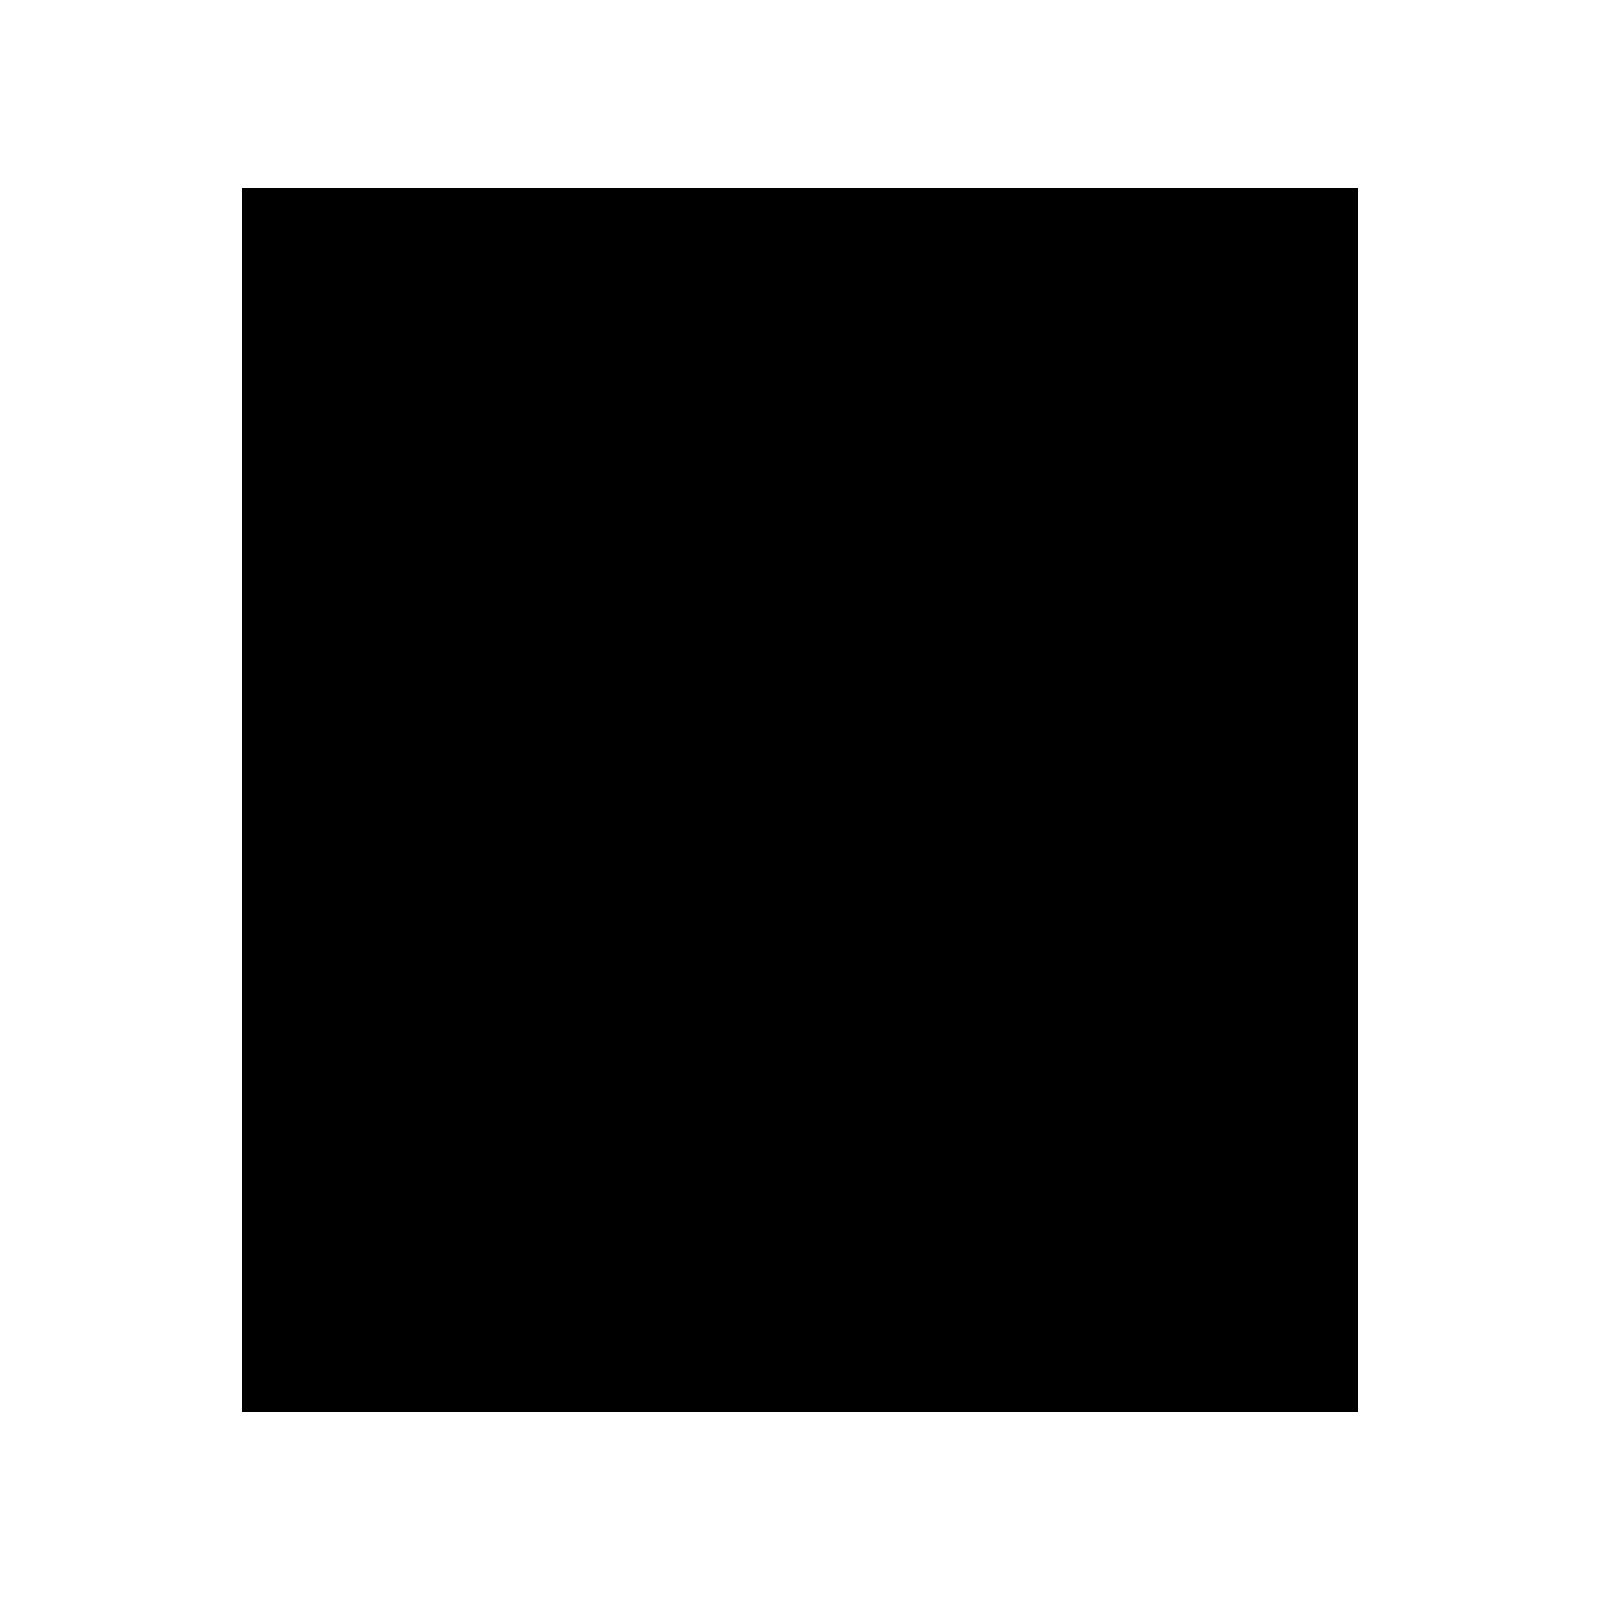 Batteria bidet con centralina